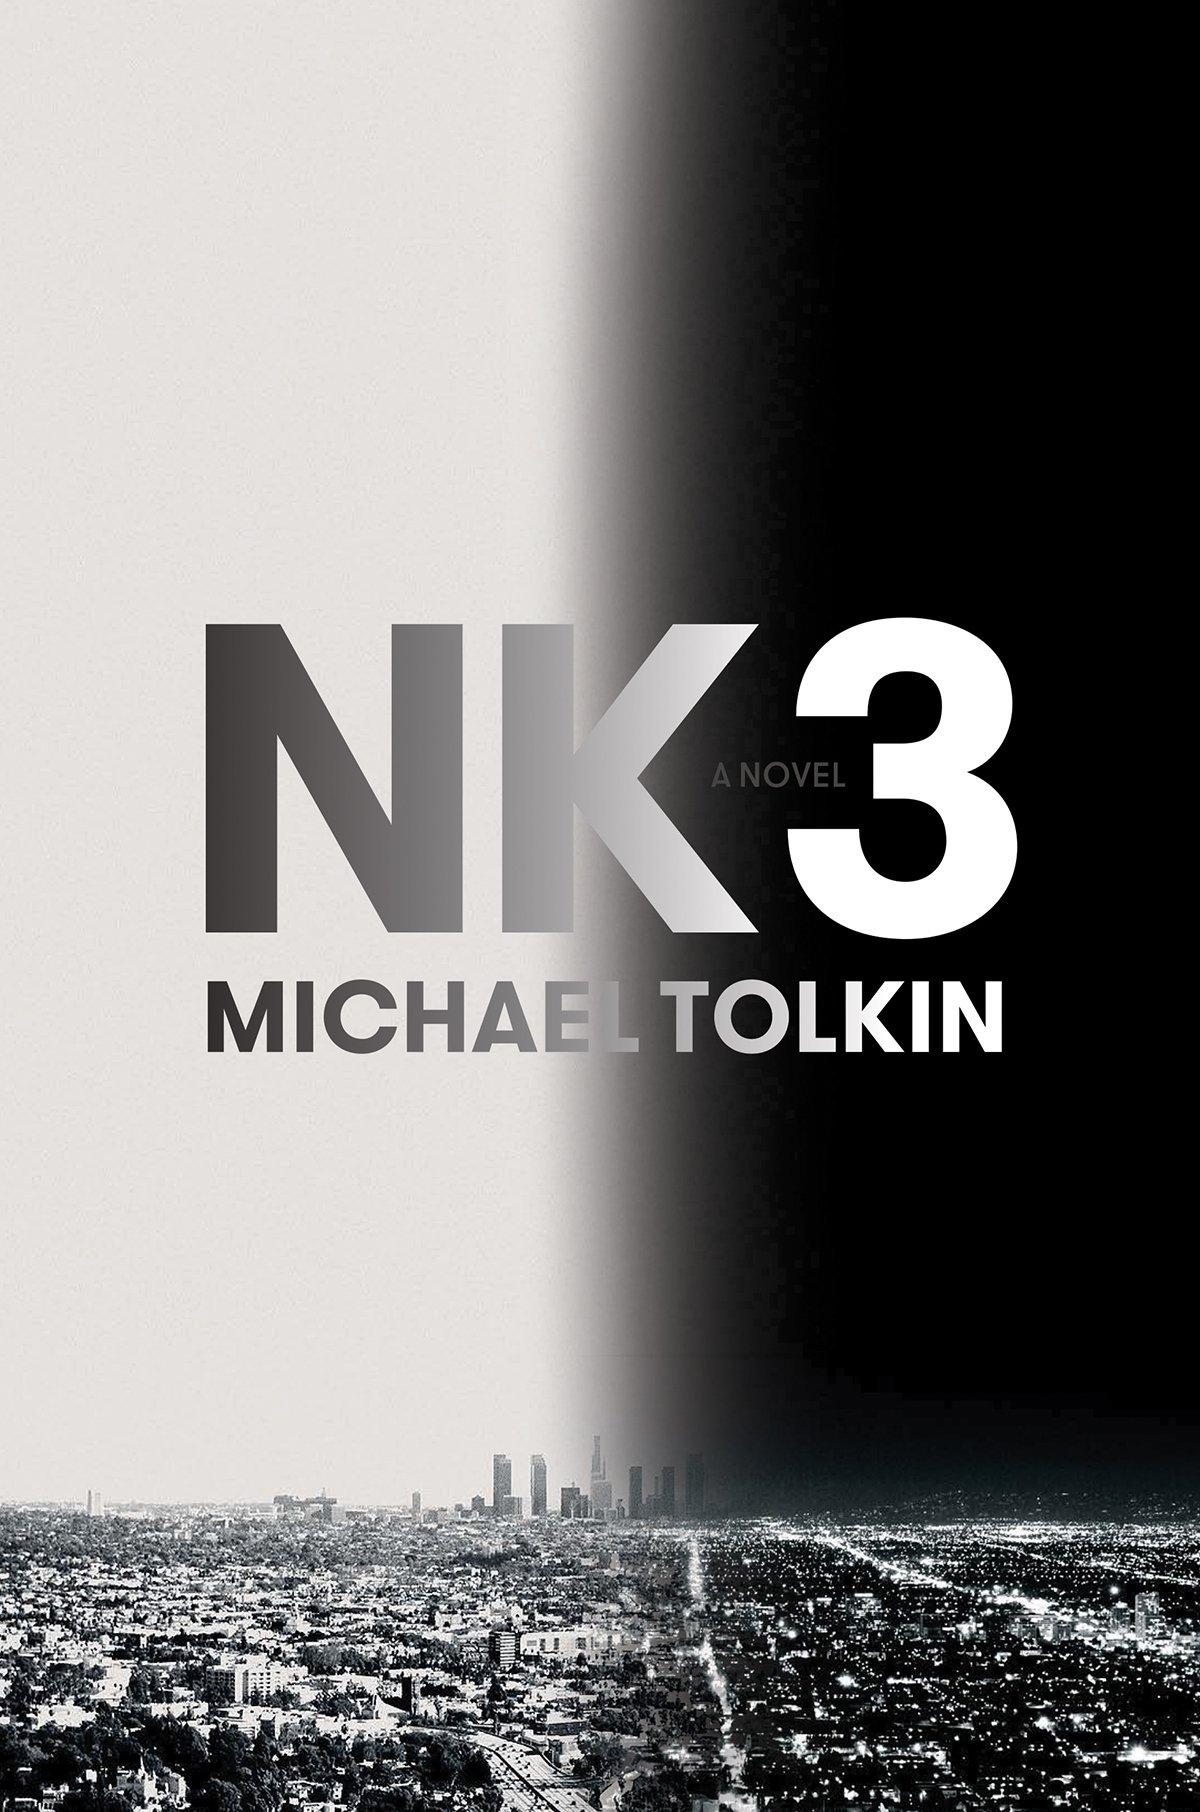 Nk3 Amazon Michael Tolkin Fremdsprachige Bücher